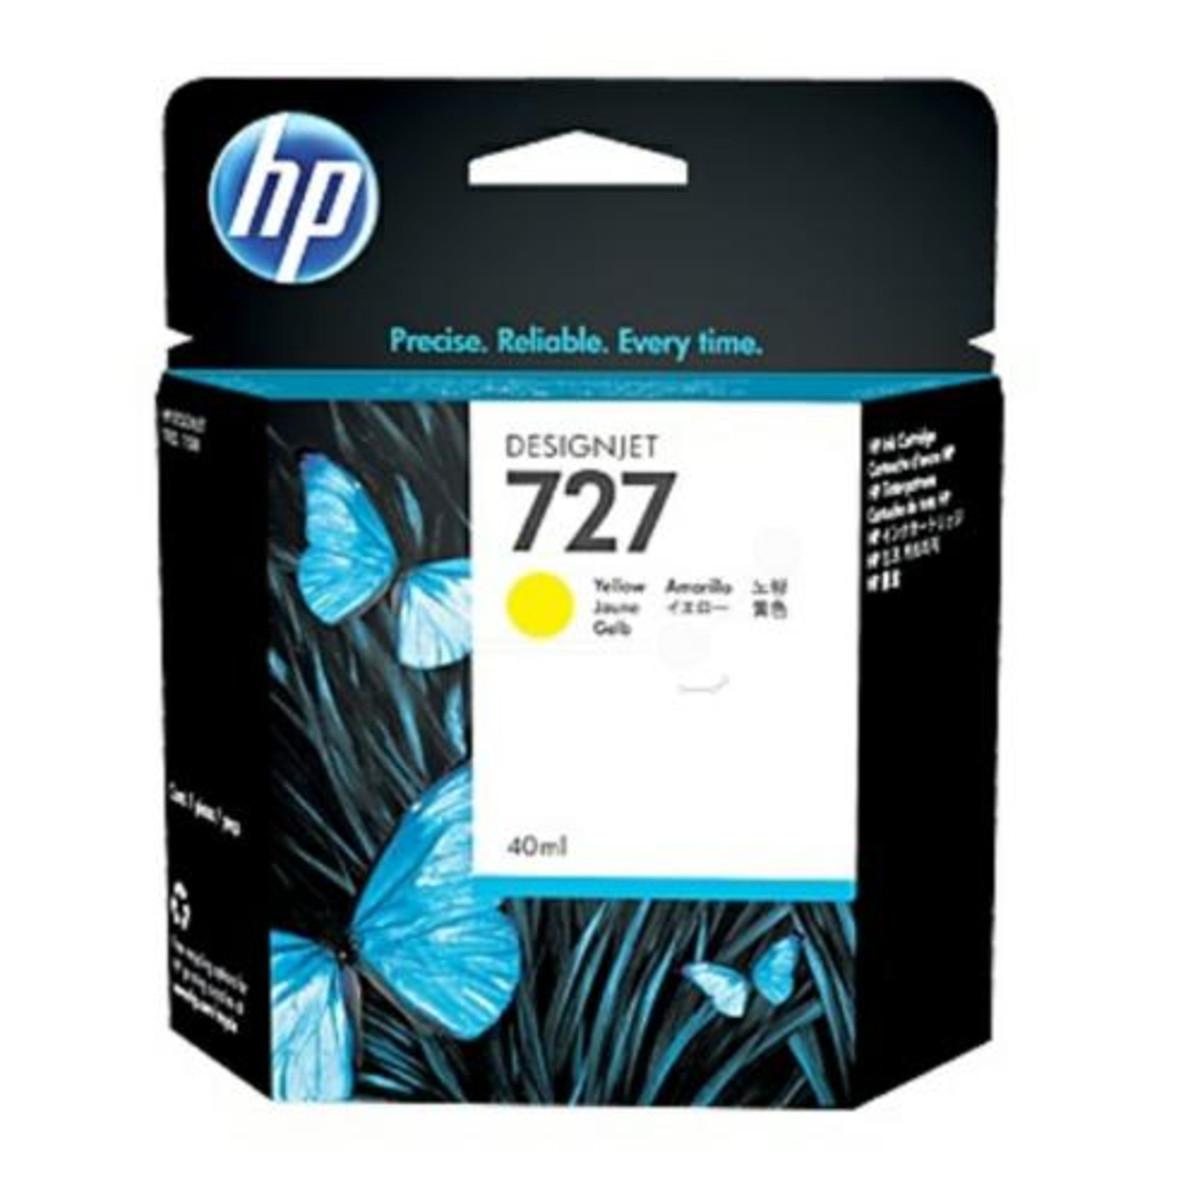 HP 727 (B3P15A) Yellow Ink Cartridge - 40 ml